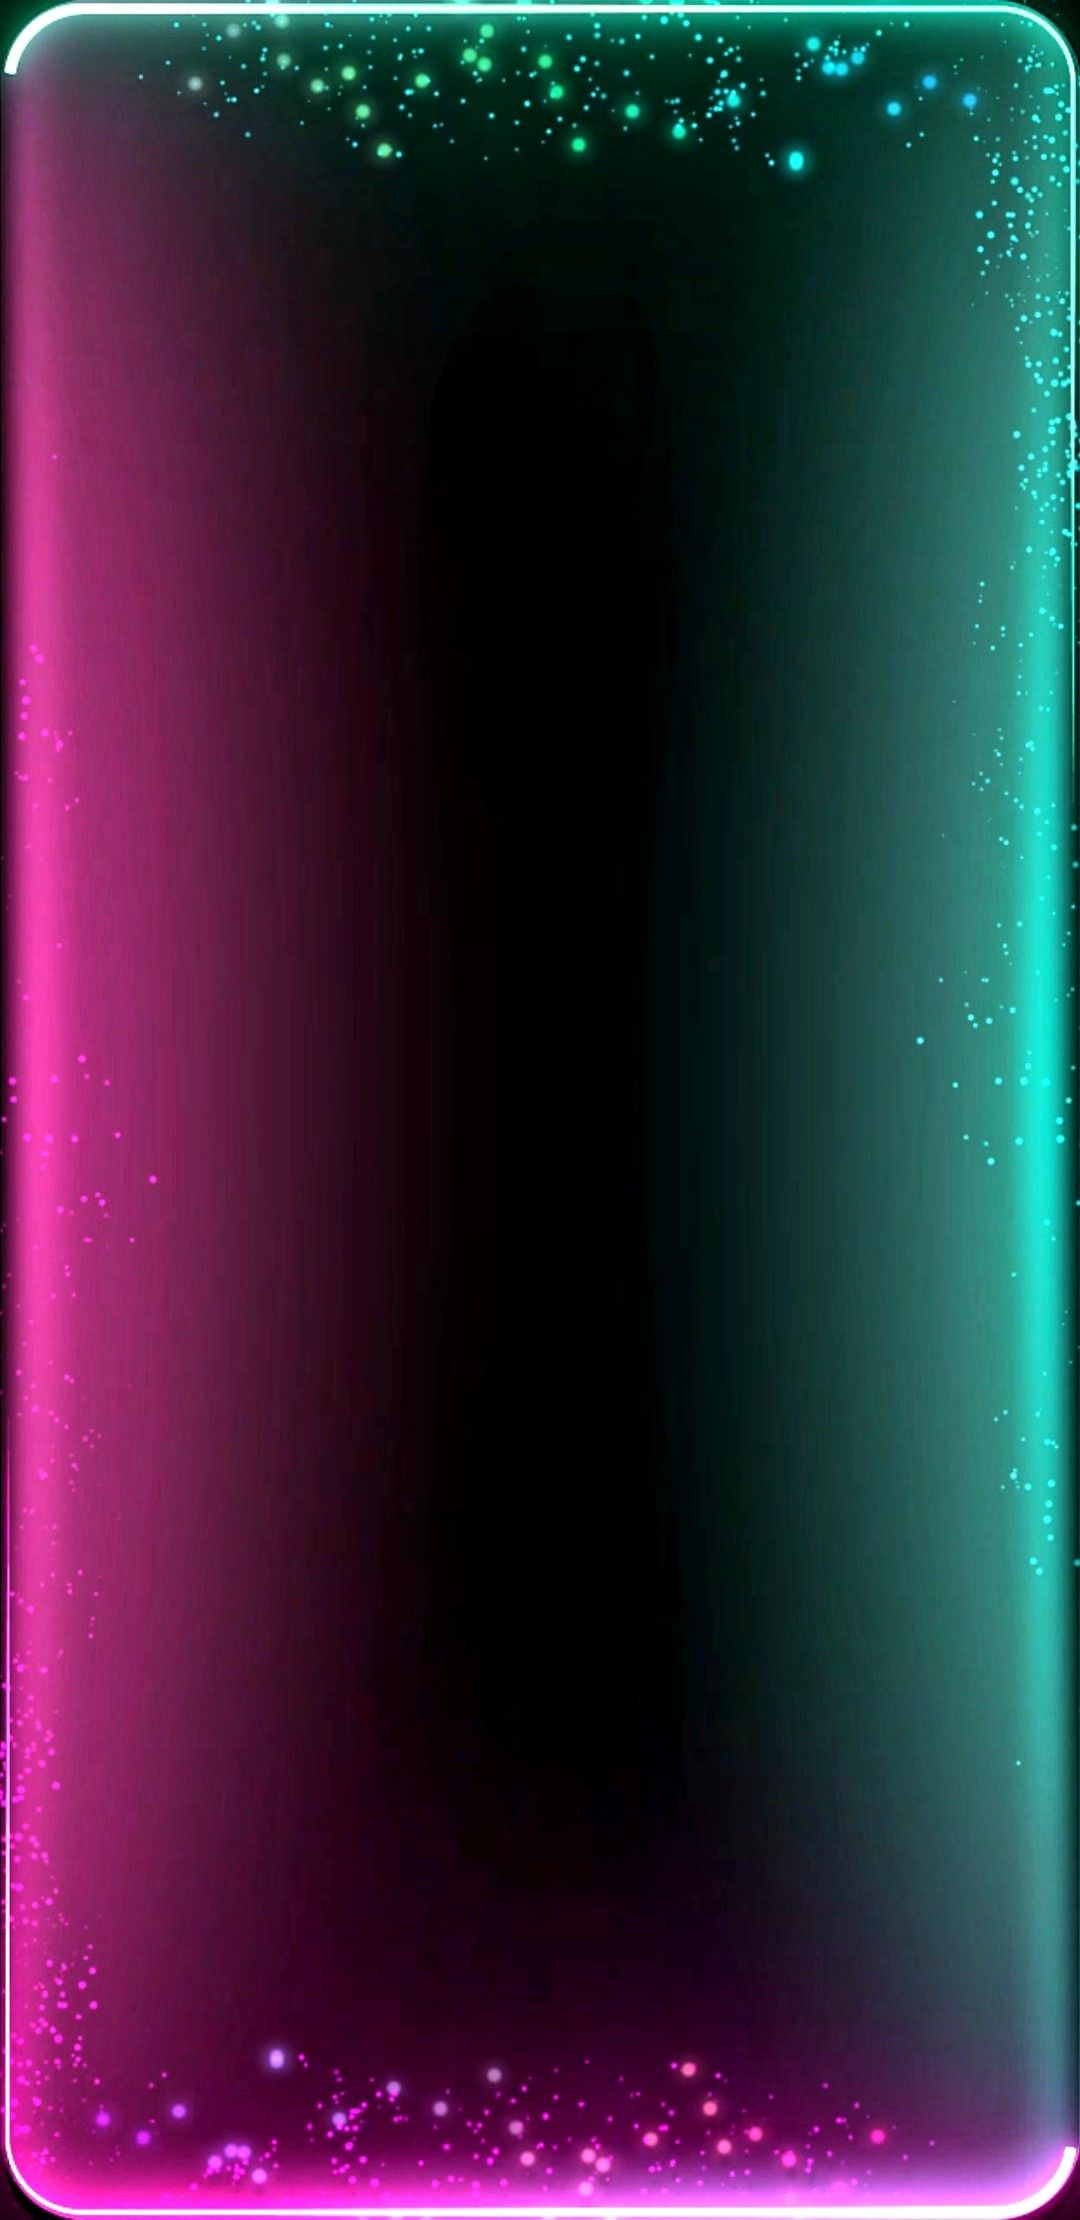 Wallpaper; Mobile Wallpaper; Wallpaper Iphone; Solid Color